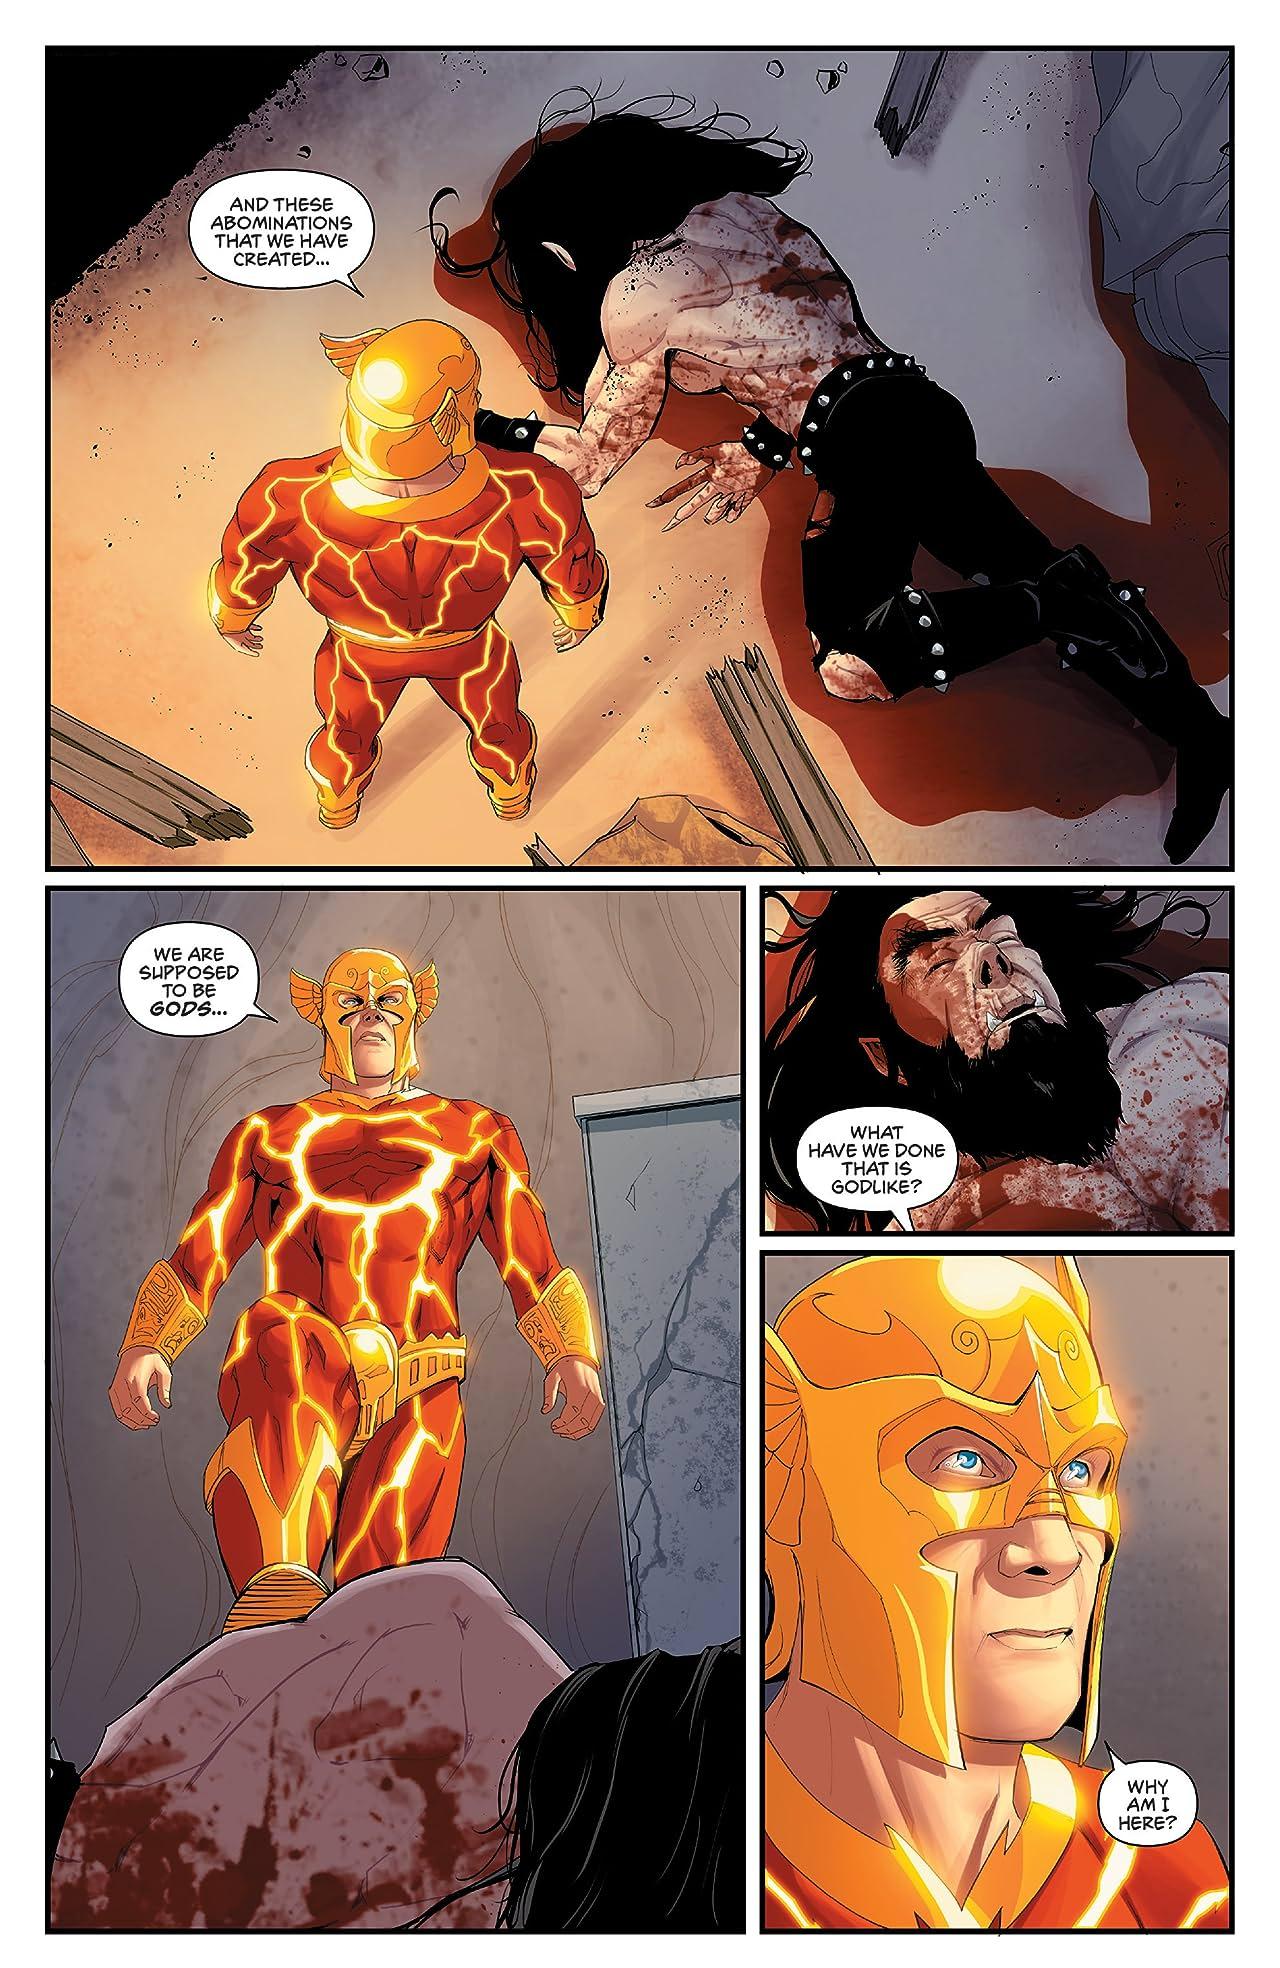 E.V.I.L. Heroes #4 (of 6)